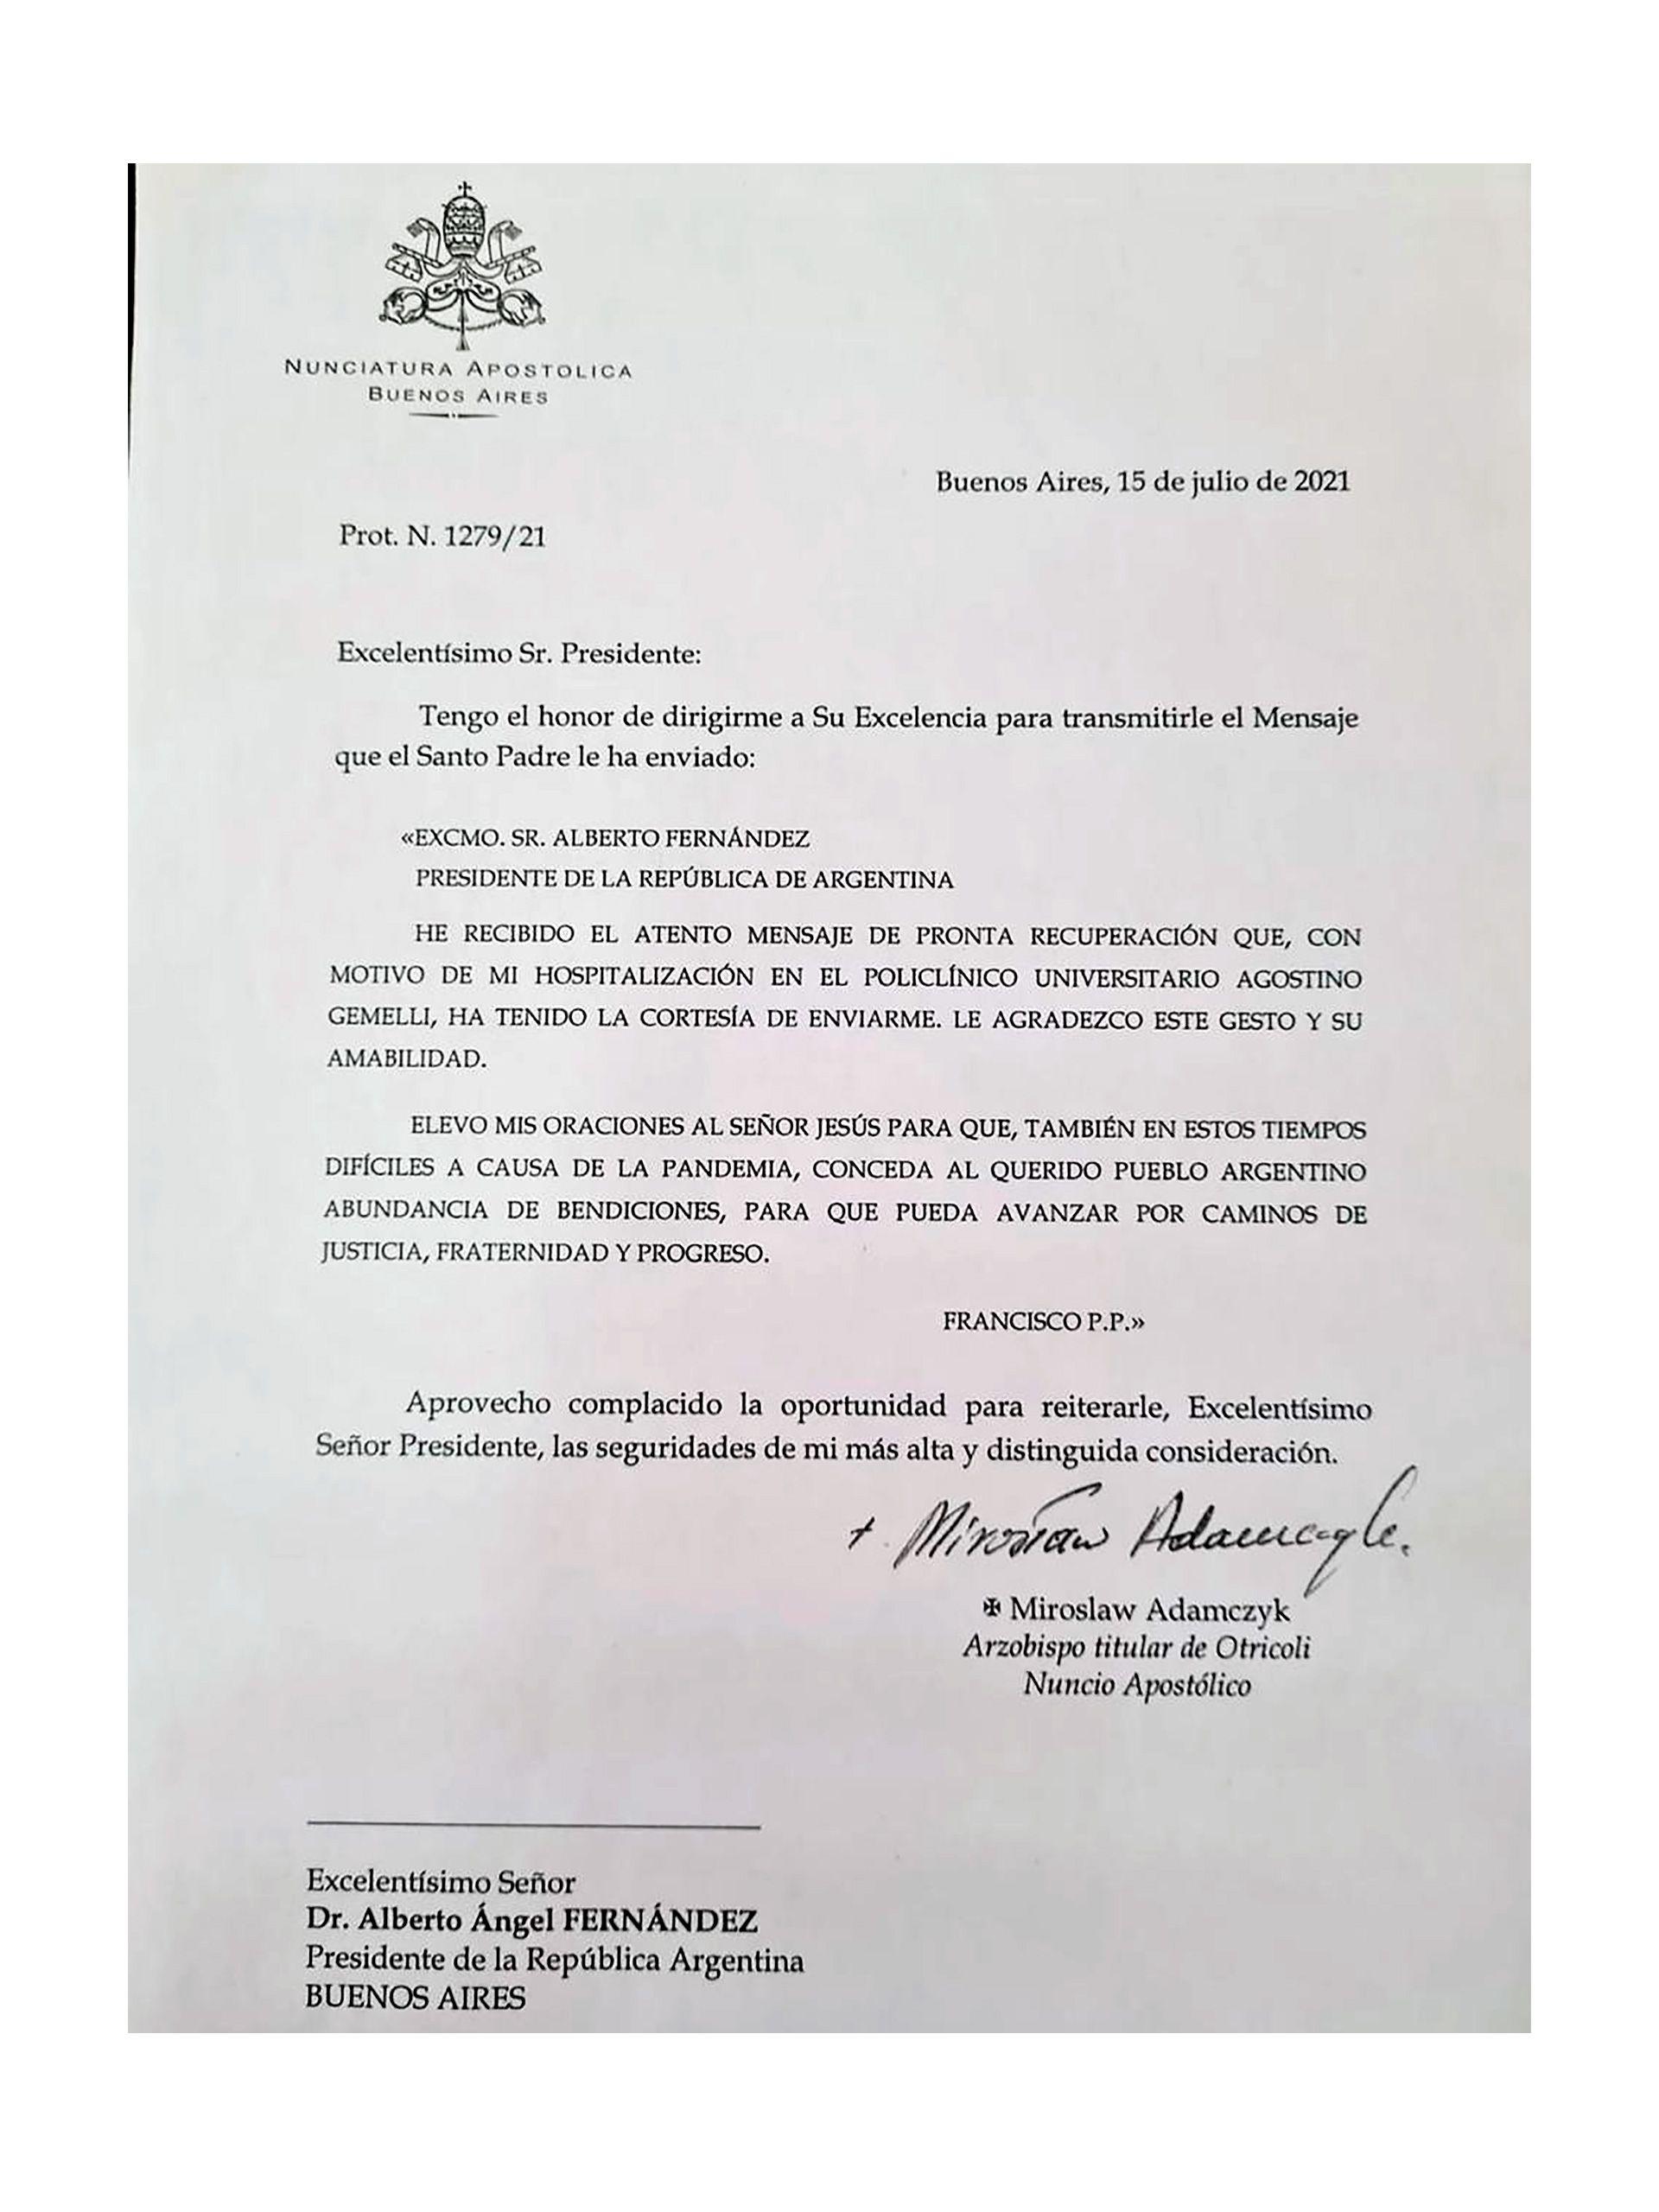 carta del papa francisco a alberto fernandez